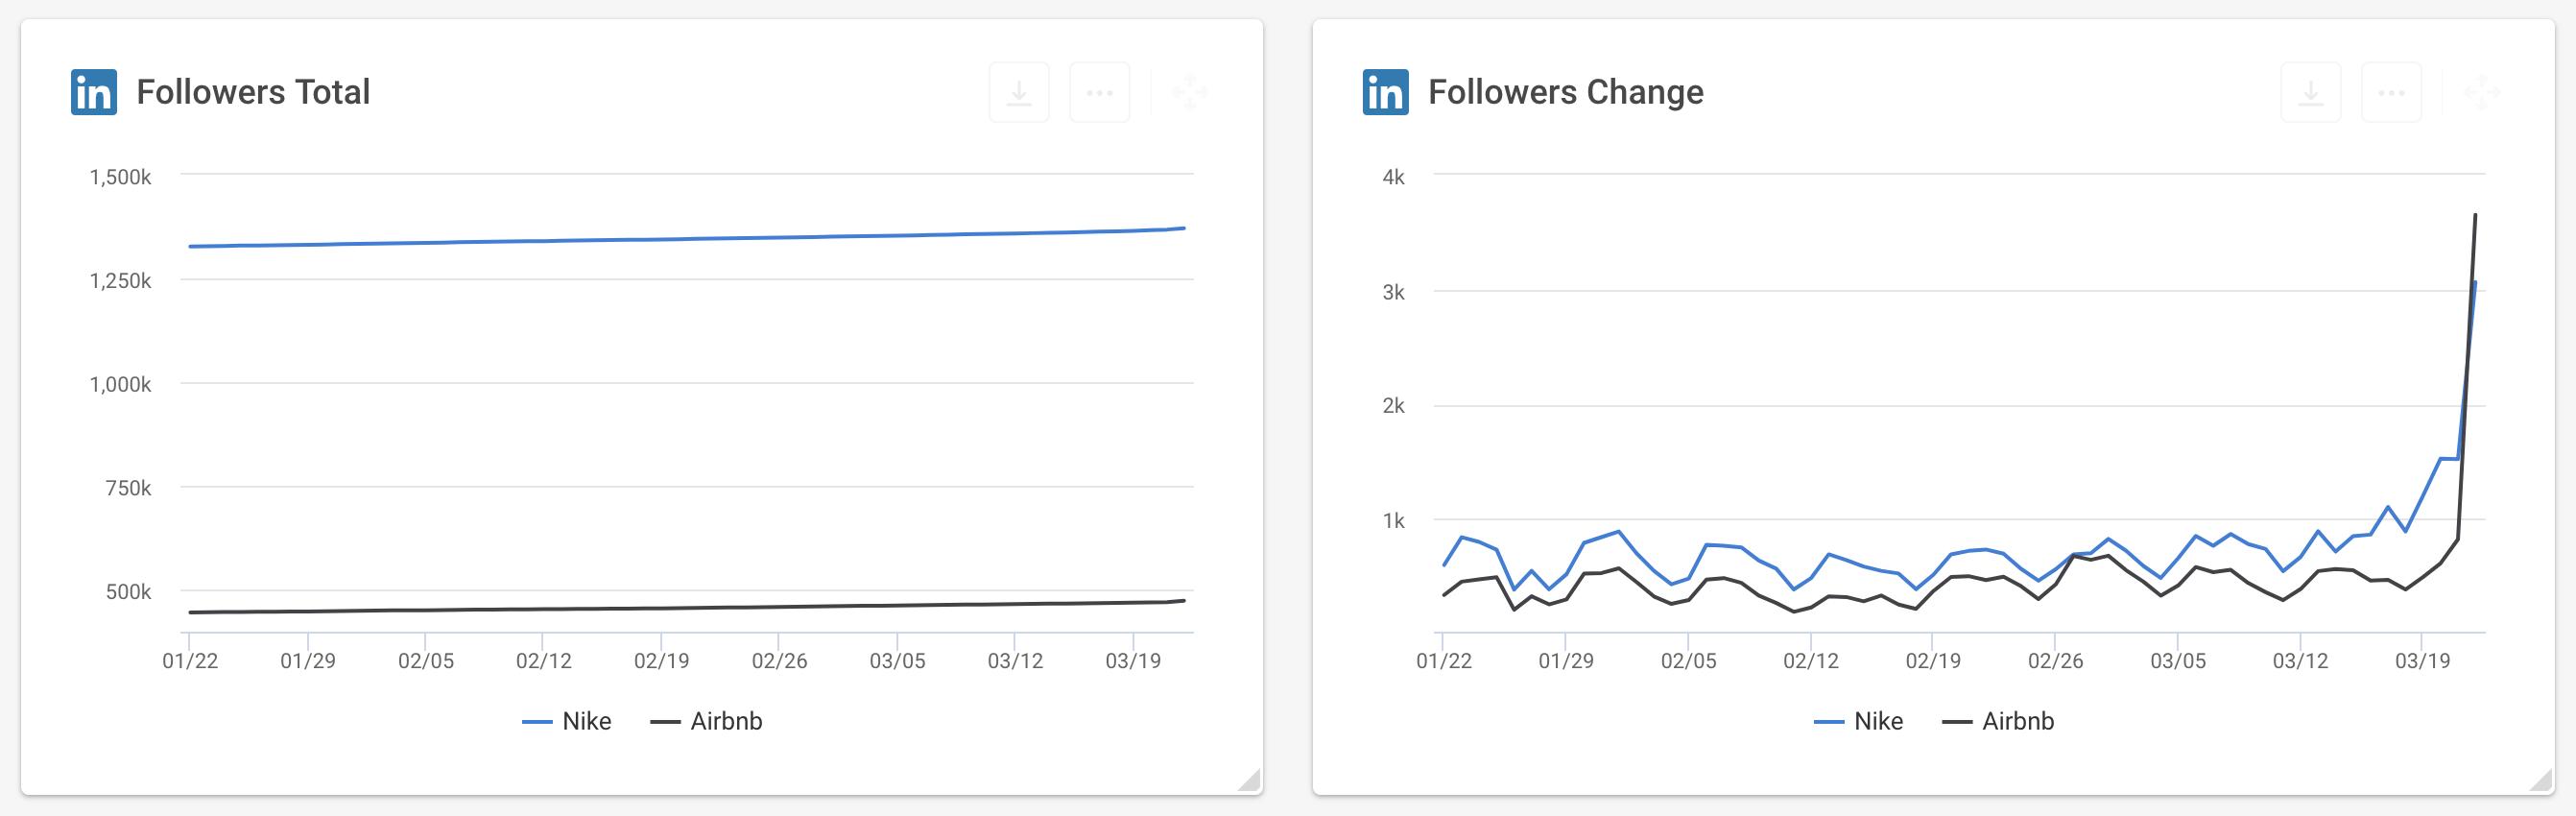 Followers Change